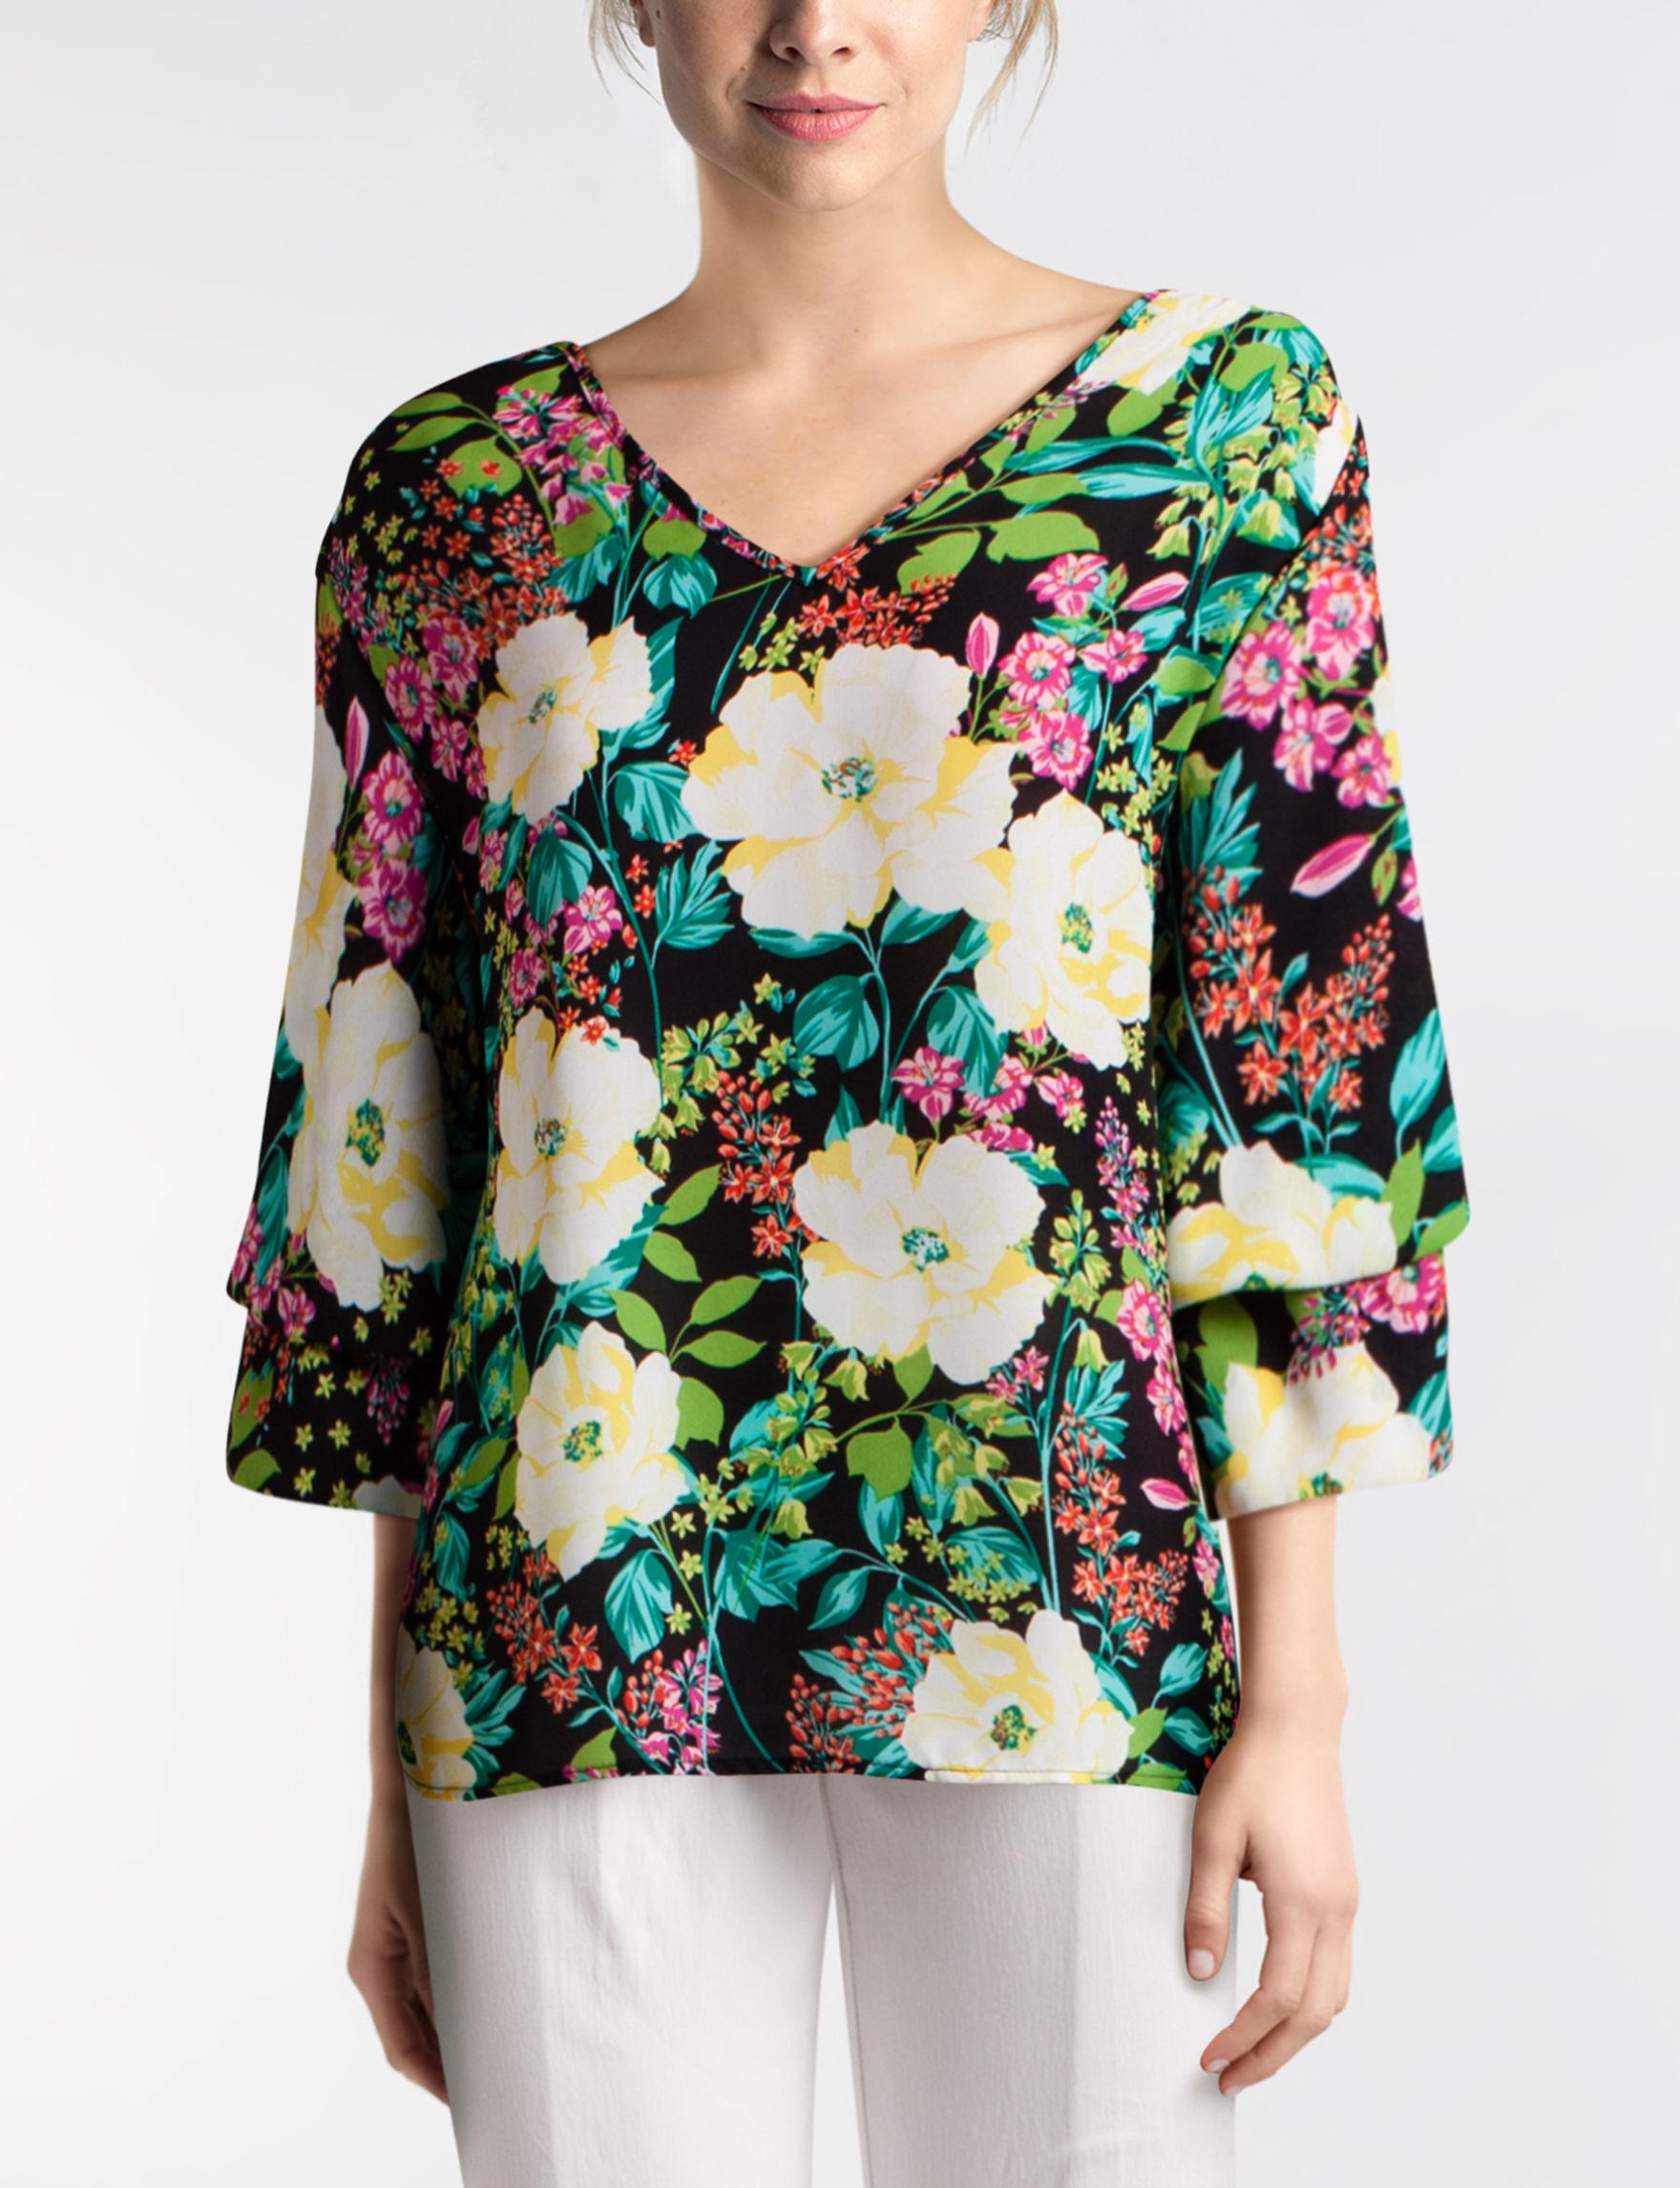 Valerie Stevens Black Floral Shirts & Blouses